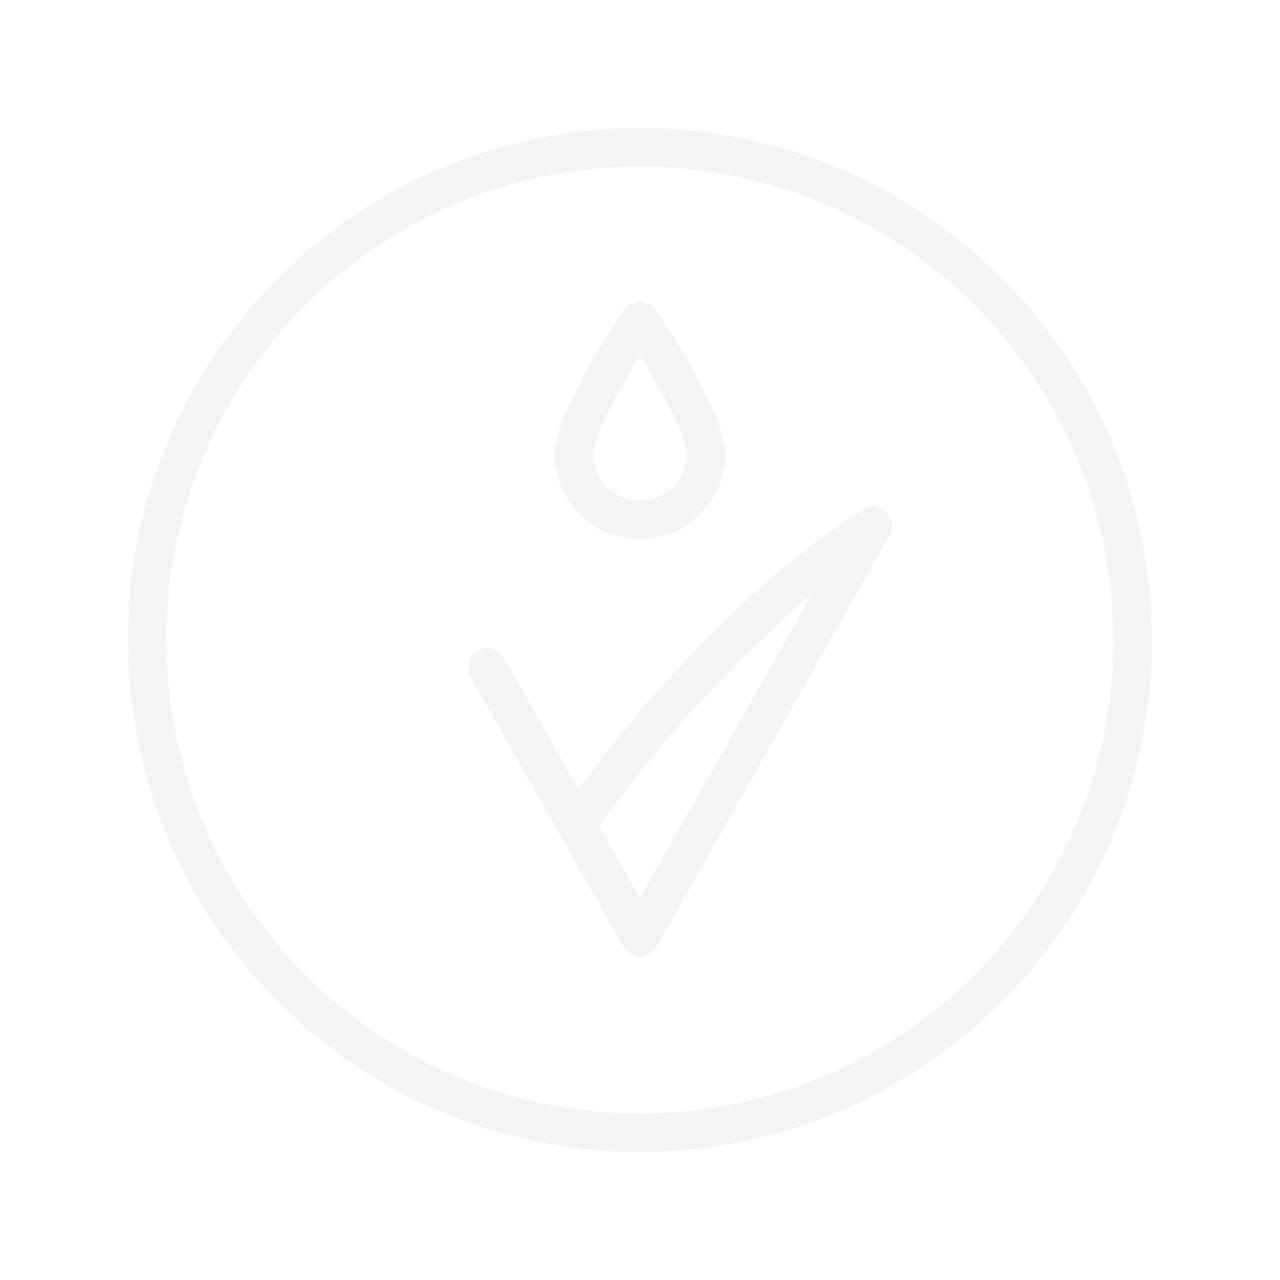 MATRIX R.A.W. Biolage Uplift Shampoo